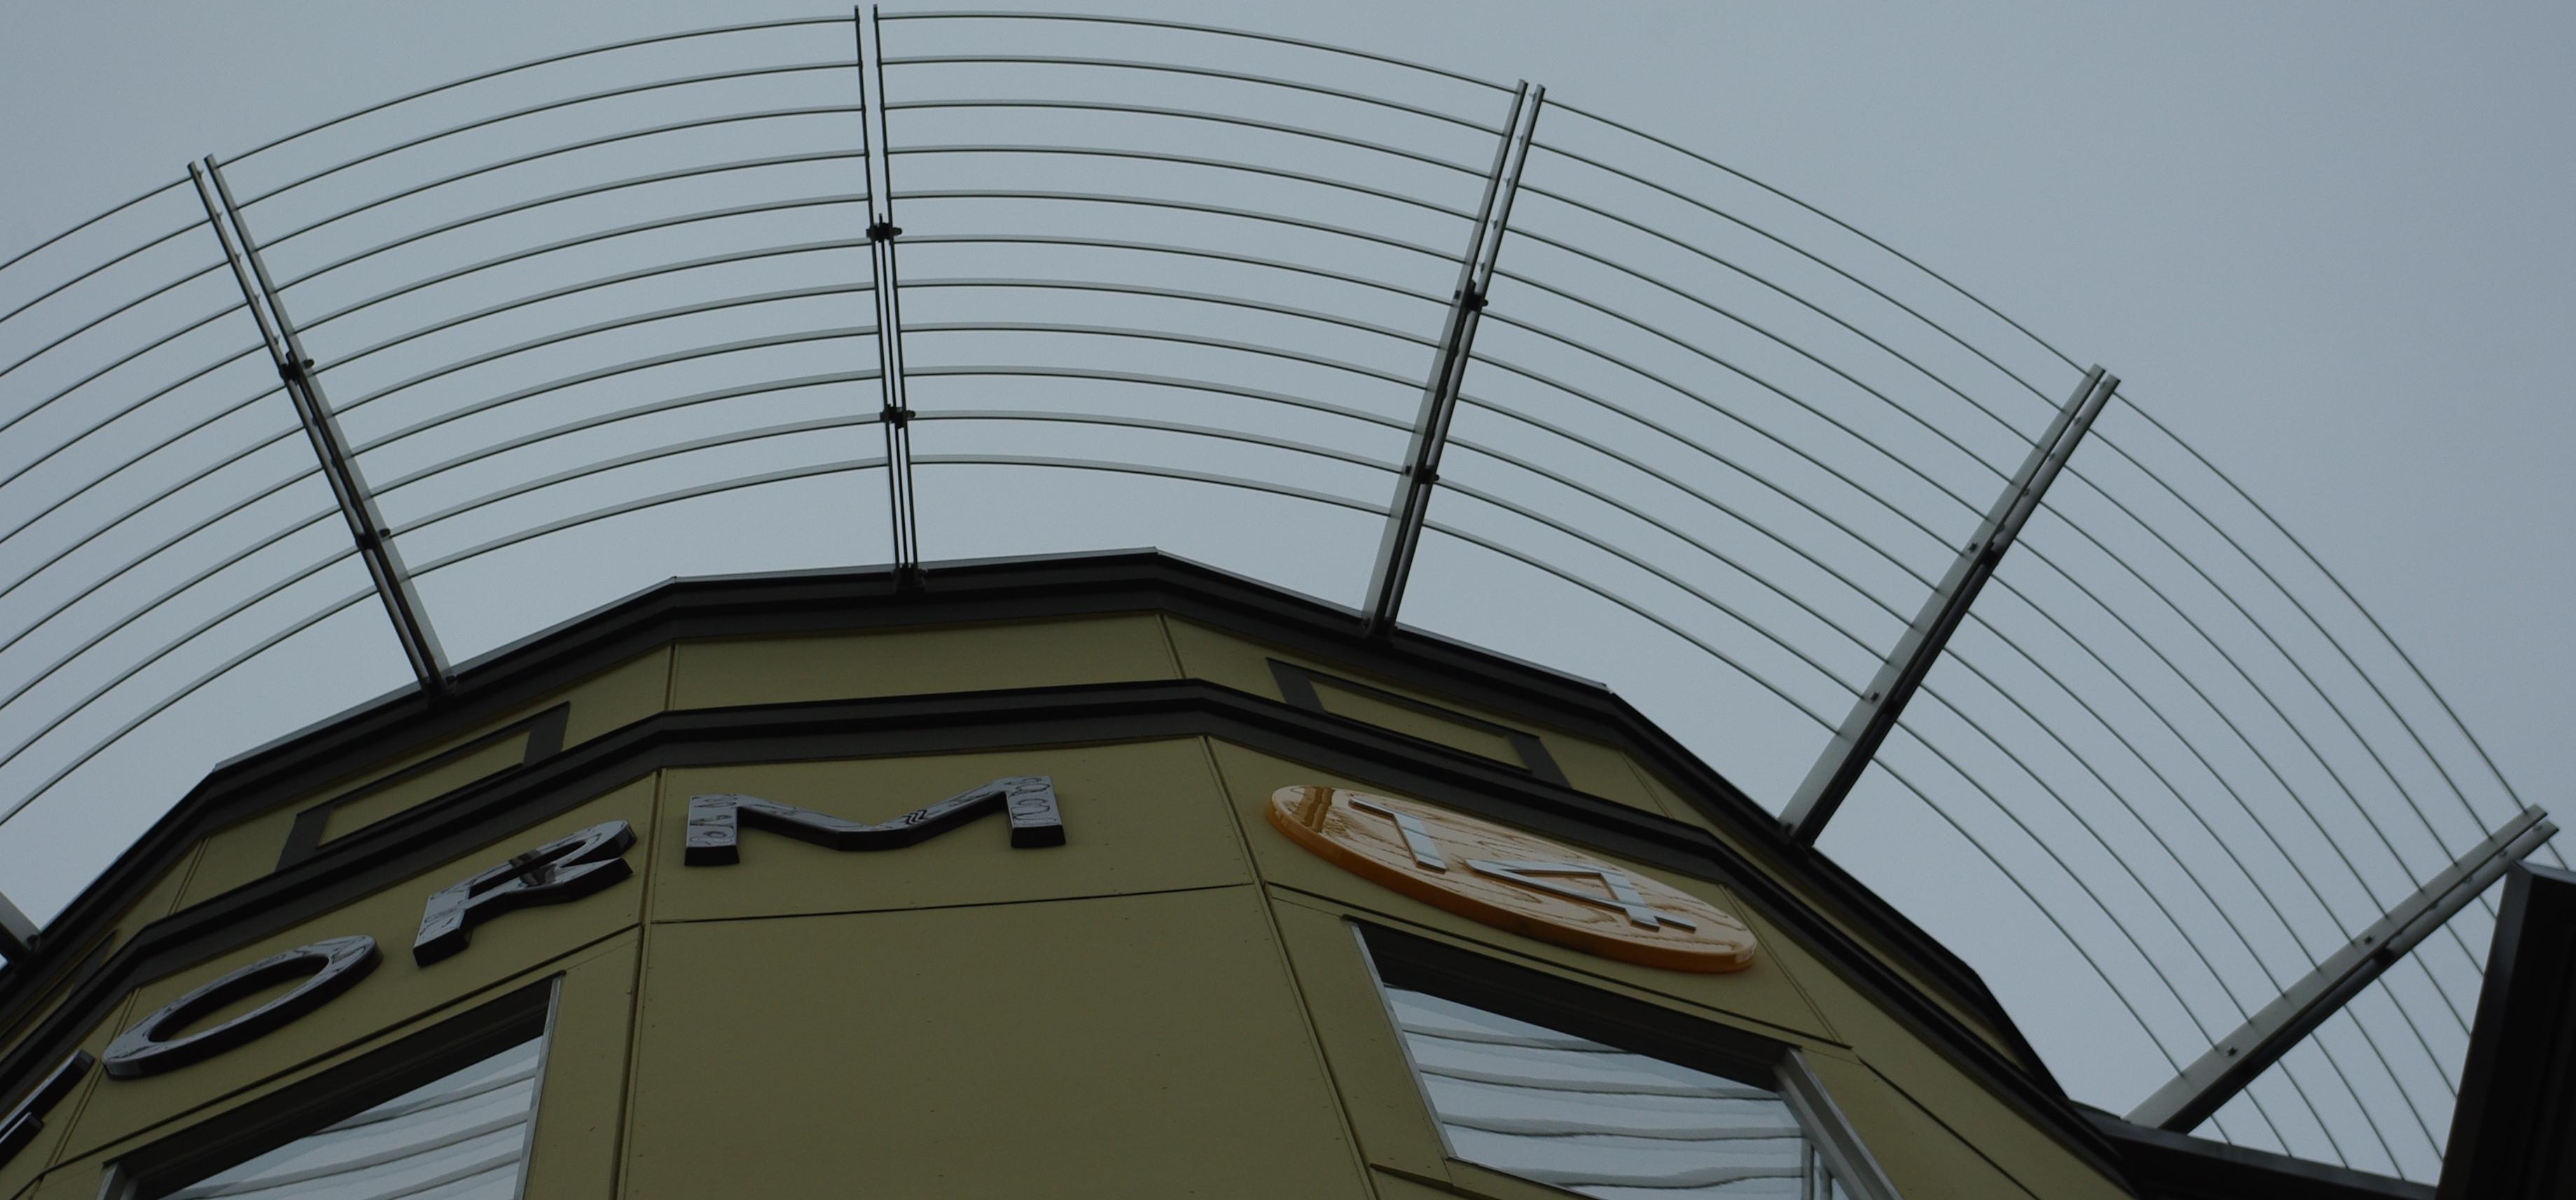 Orenco Station